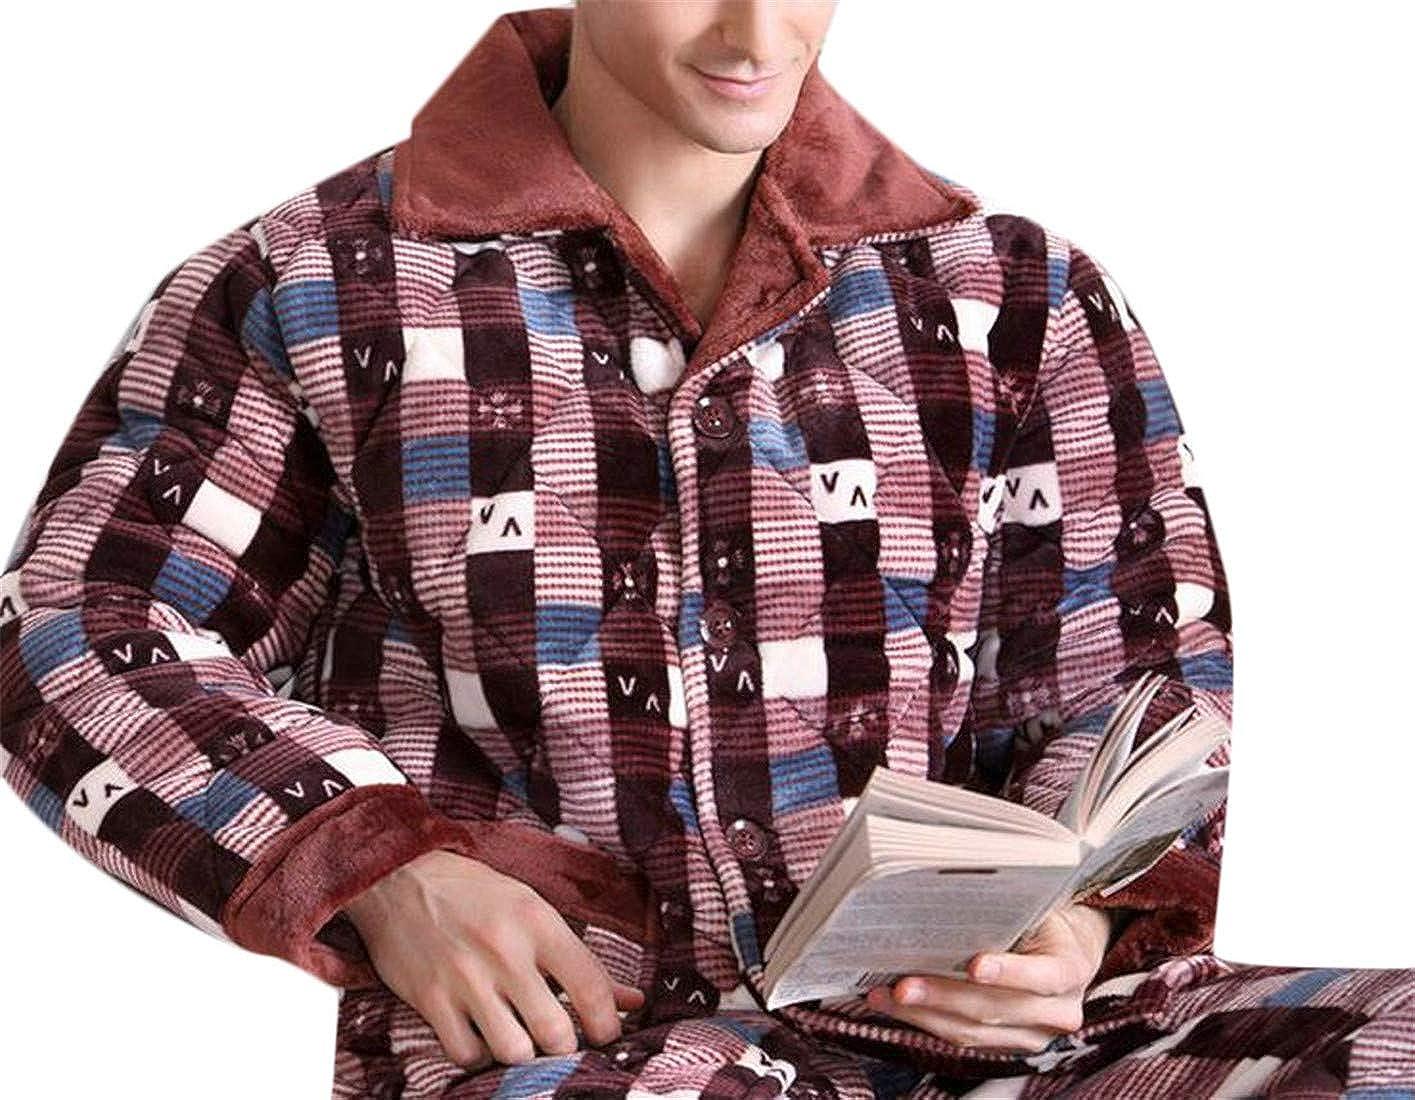 Wofupowga Mens 2 Piece Lounge Sleepwear Winter Thicken Printed Pajama Set